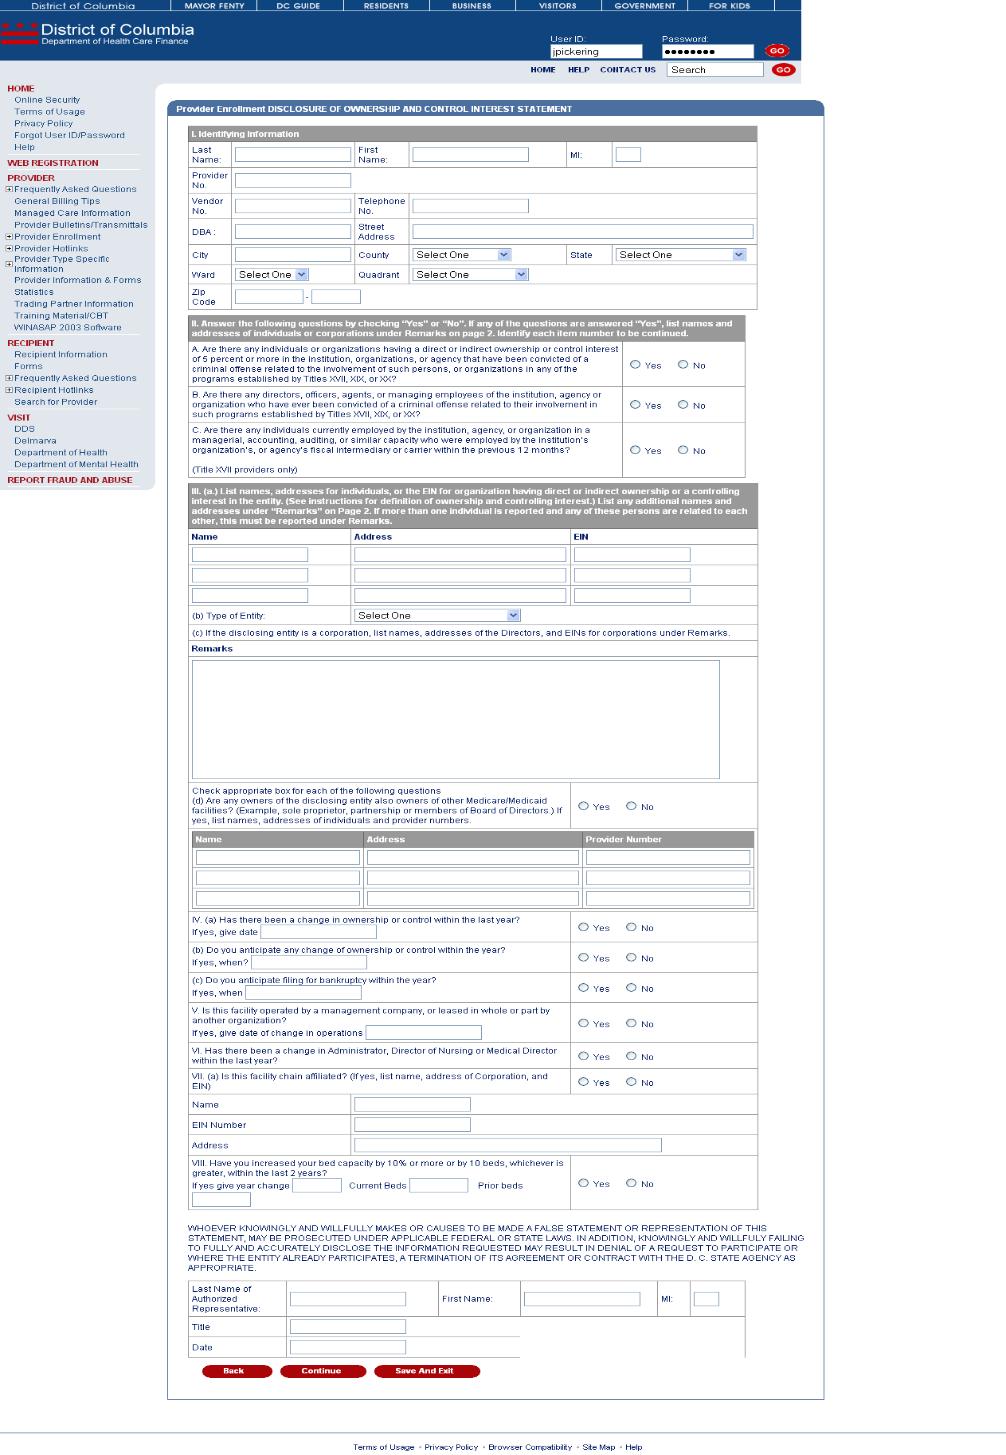 iowa medicaid provider enrollment application